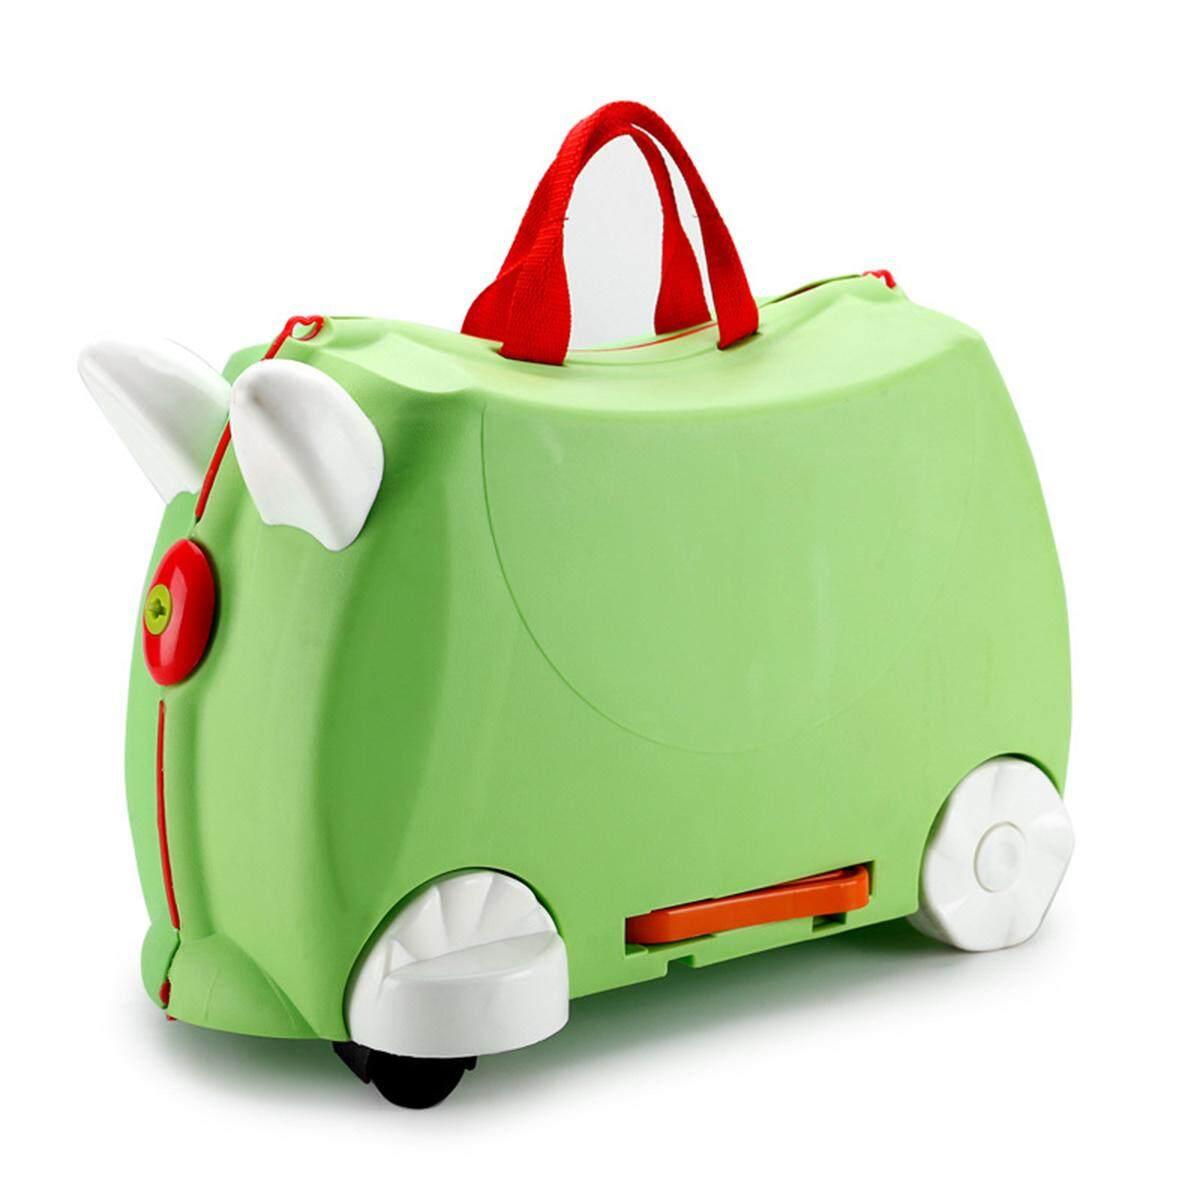 Ride On Suitcase Toy Box Kids Children Travel Luggage 3 Colour Pink Blue Hqlu577 By Freebang.